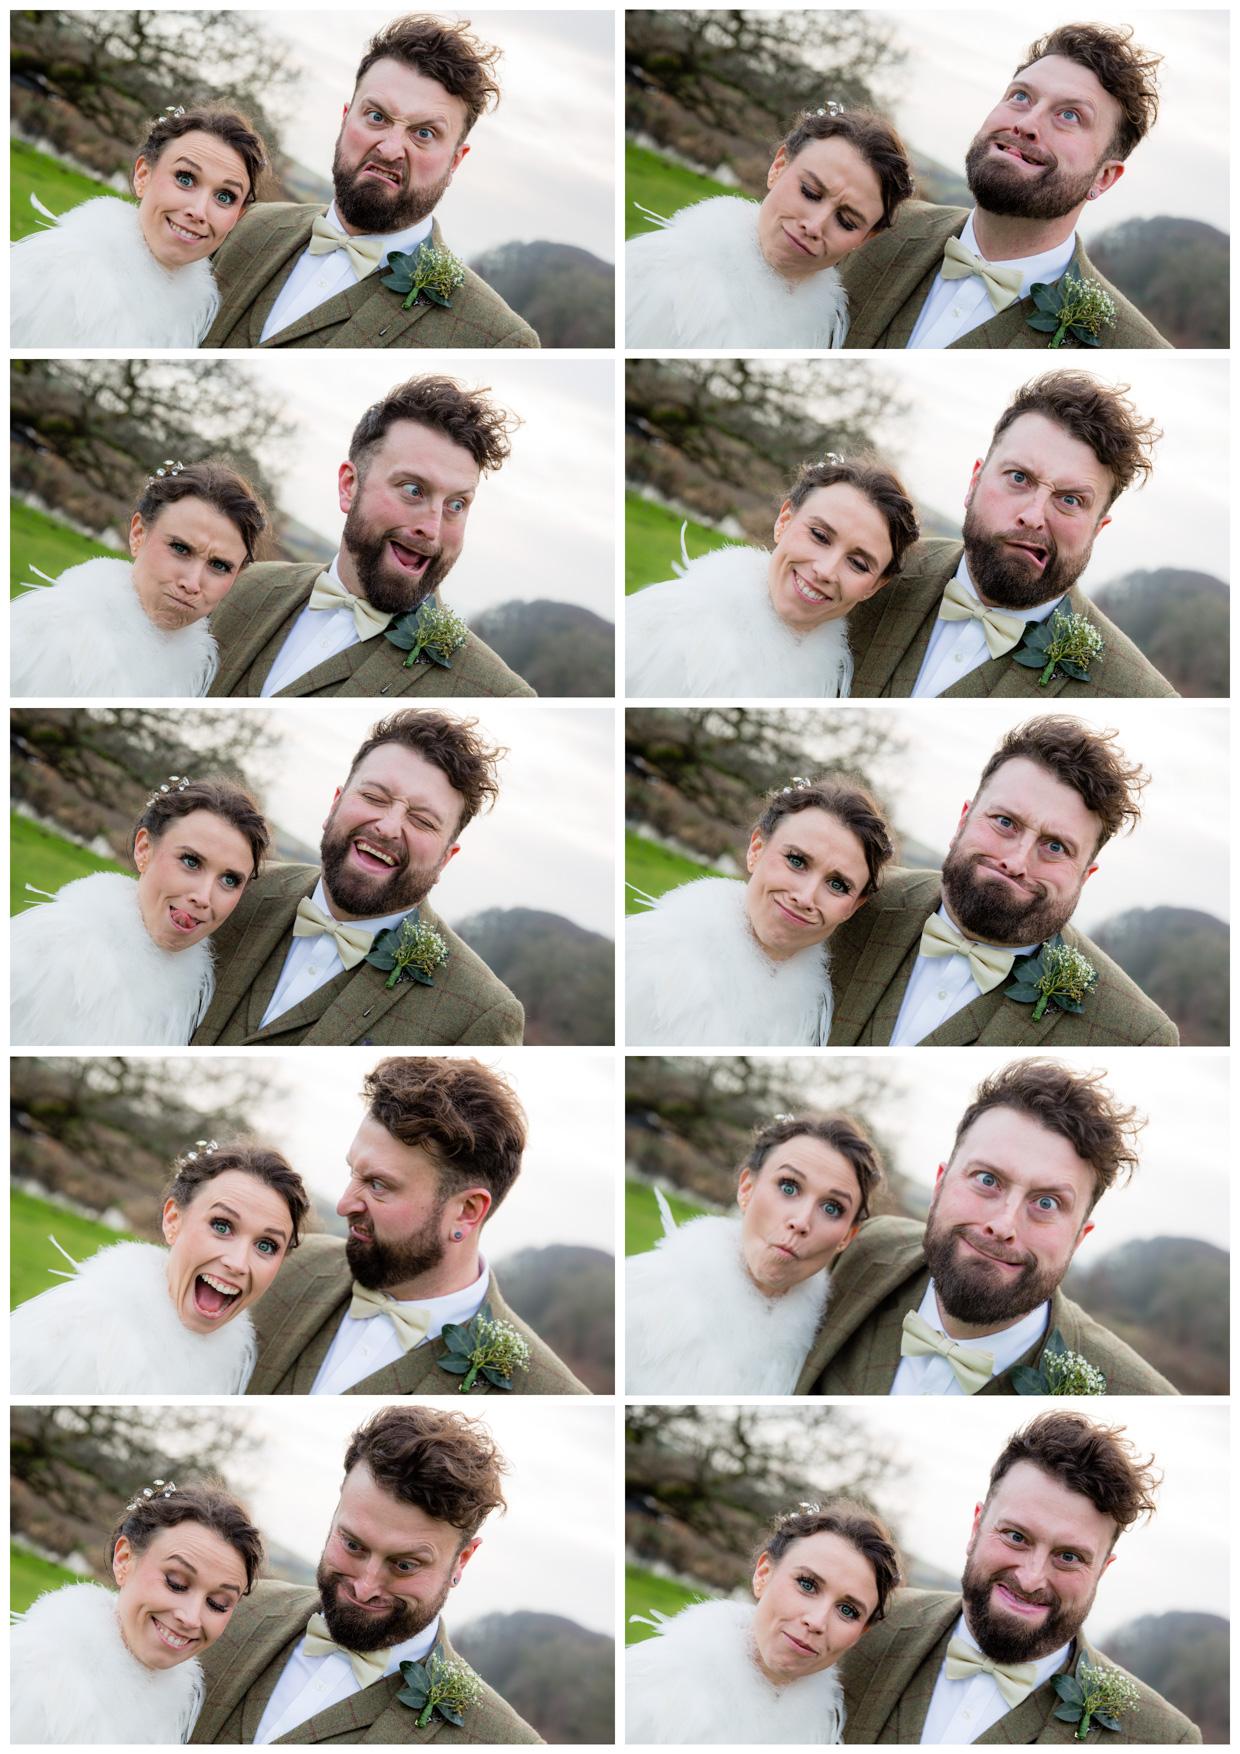 Jess & Ben - Bristol Wedding Photographer - Wright Wedding Photography - 123